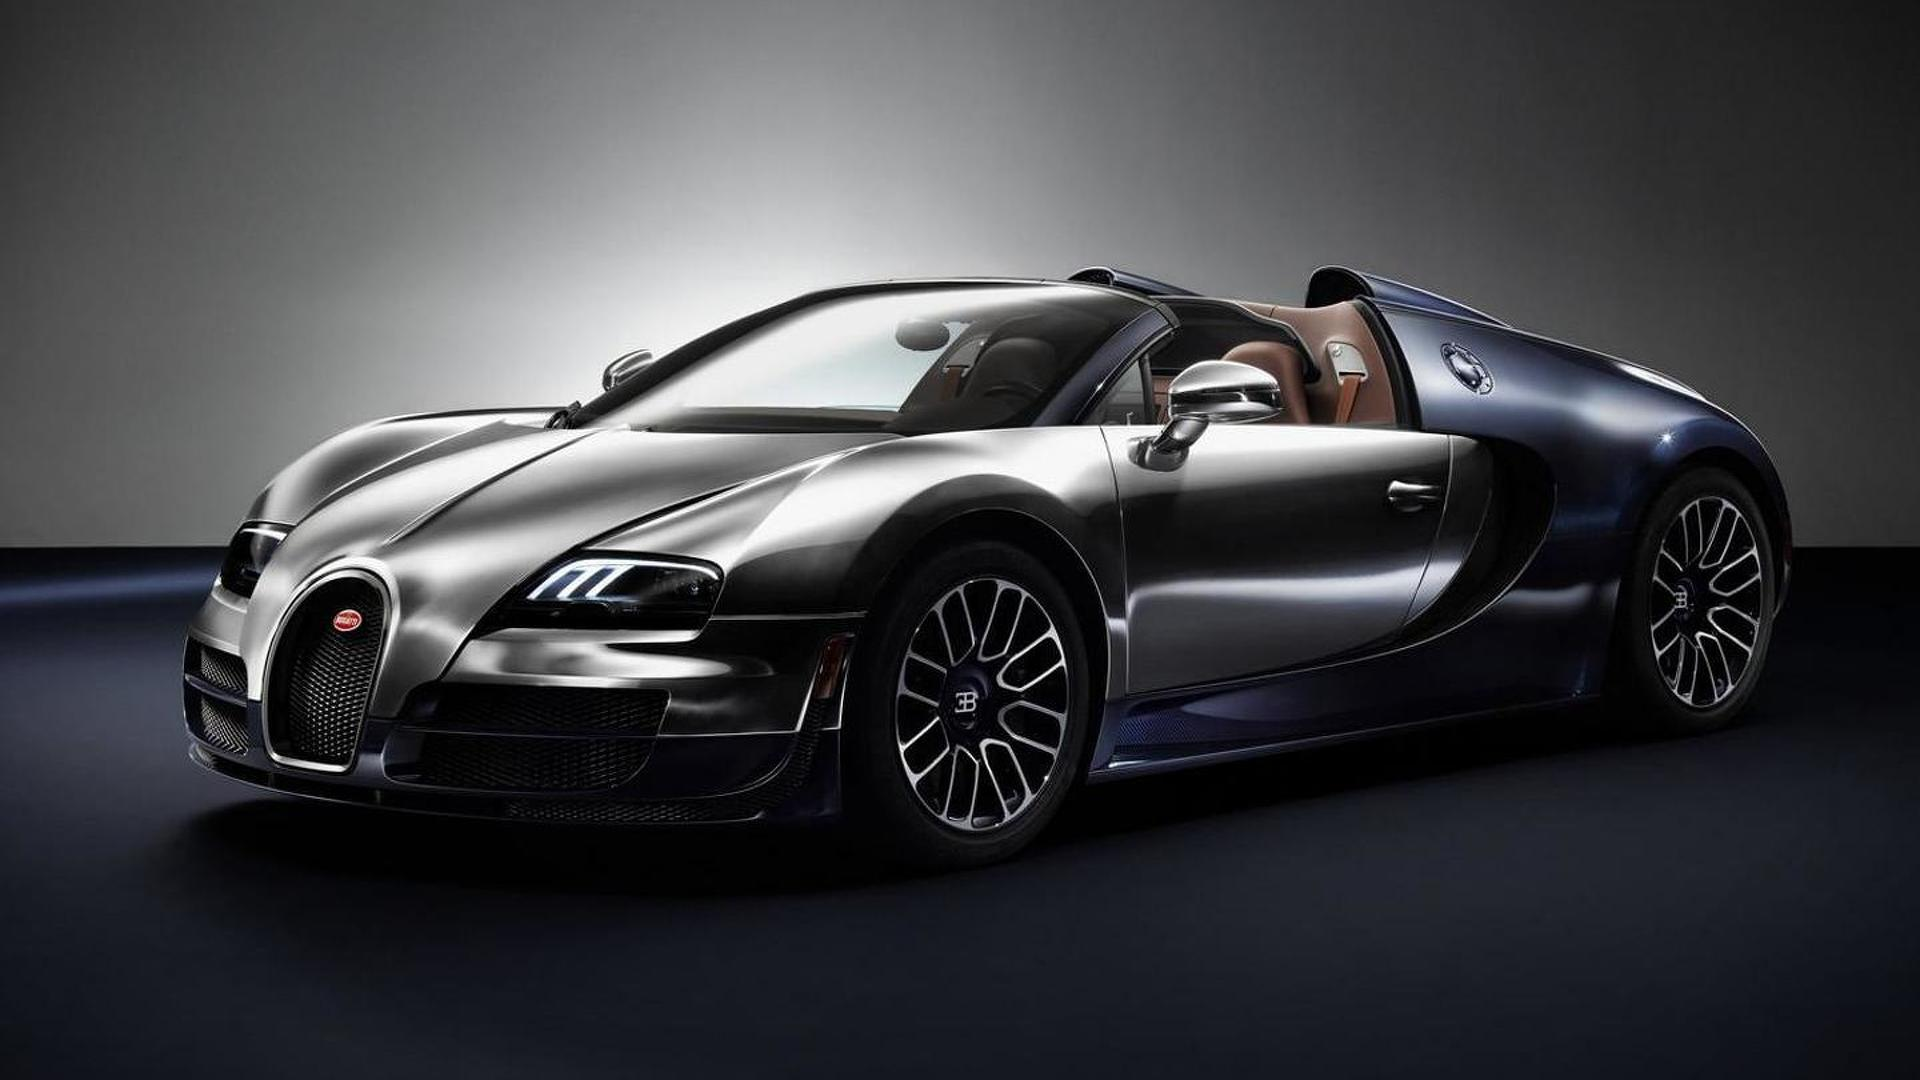 2014-493292-bugatti-veyron-ettore-bugatti-special-edition1 Wonderful Bugatti Veyron Grand Sport Vitesse Mansory Vivere 2014 Cars Trend